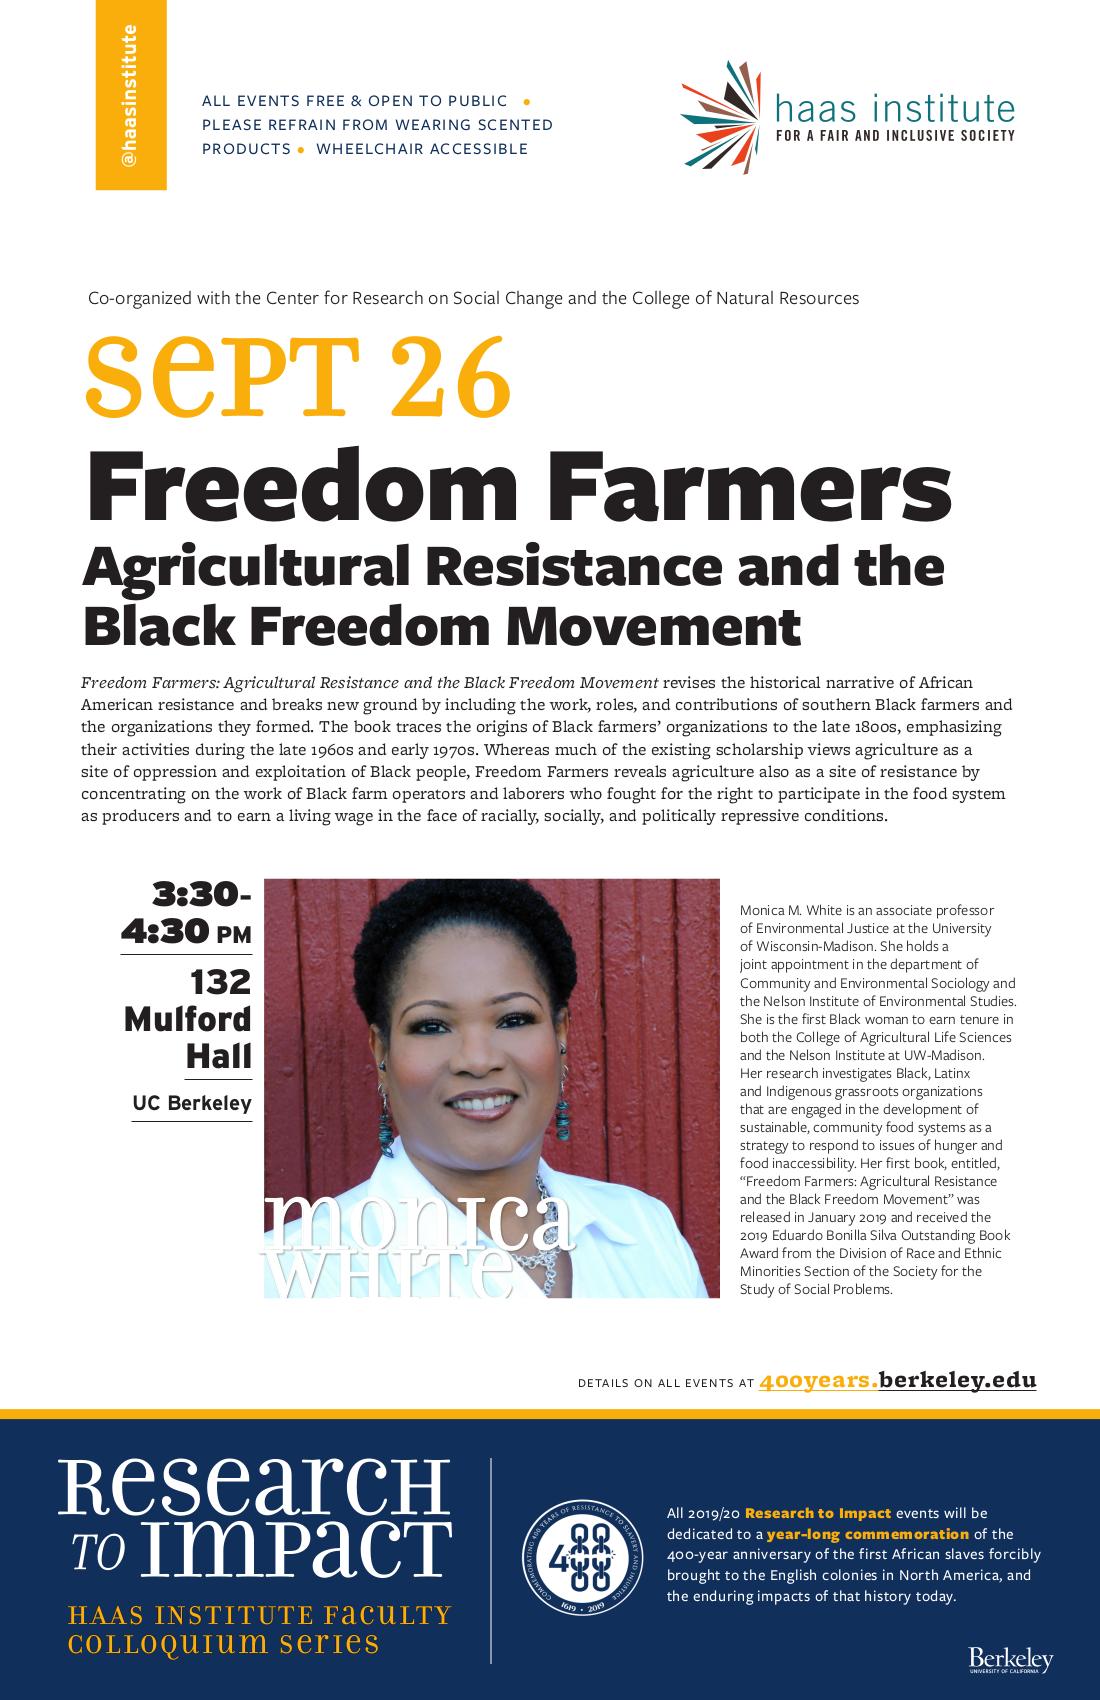 Monica White event flier